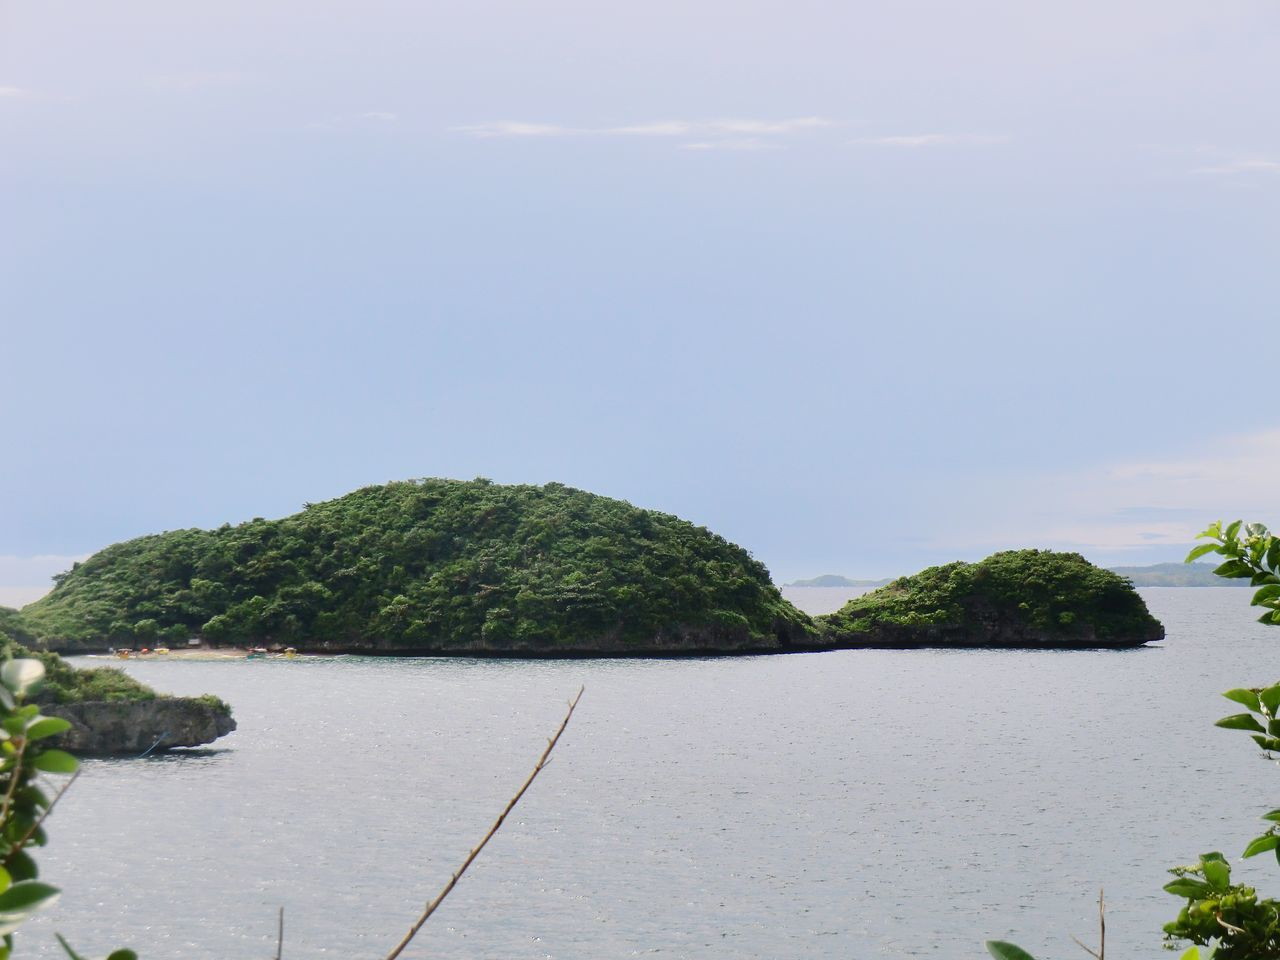 Turtle Island HundredIslandPhilippines Landscape Outdoors Beauty In Nature Sky Sea